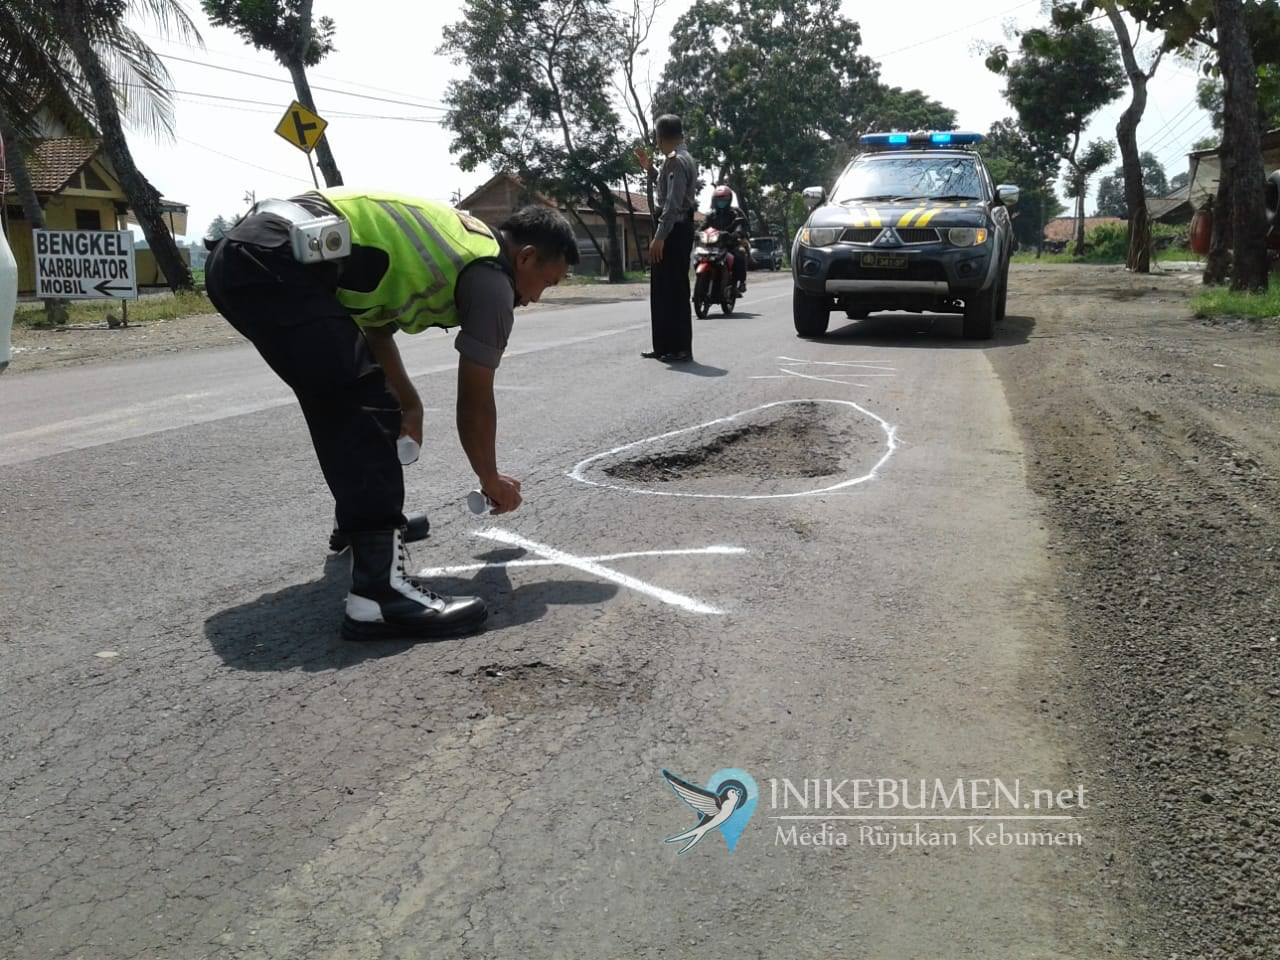 Cegah Laka Lantas, Polisi di Kebumen Urug dan Tandai Jalan Berlubang